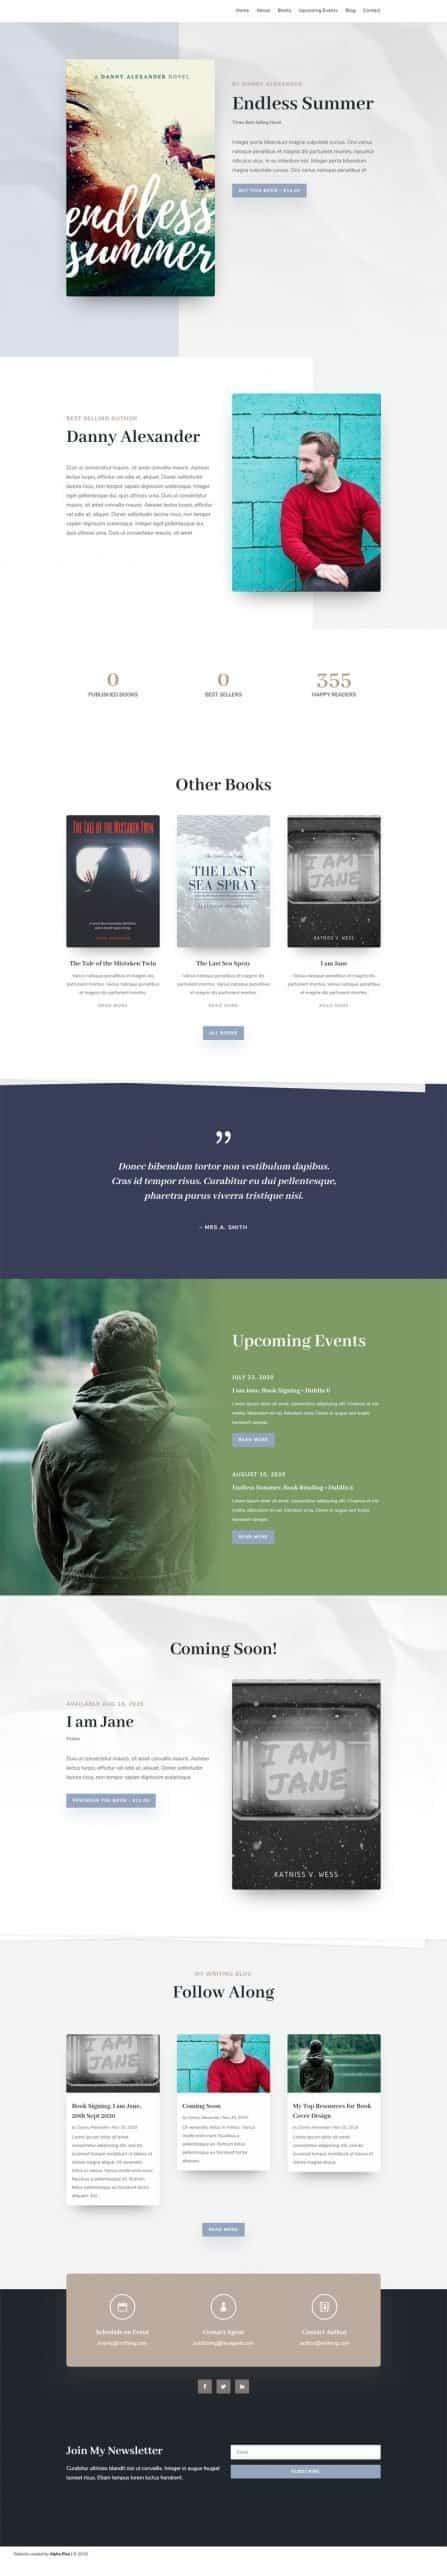 Screenshot of the Author Website